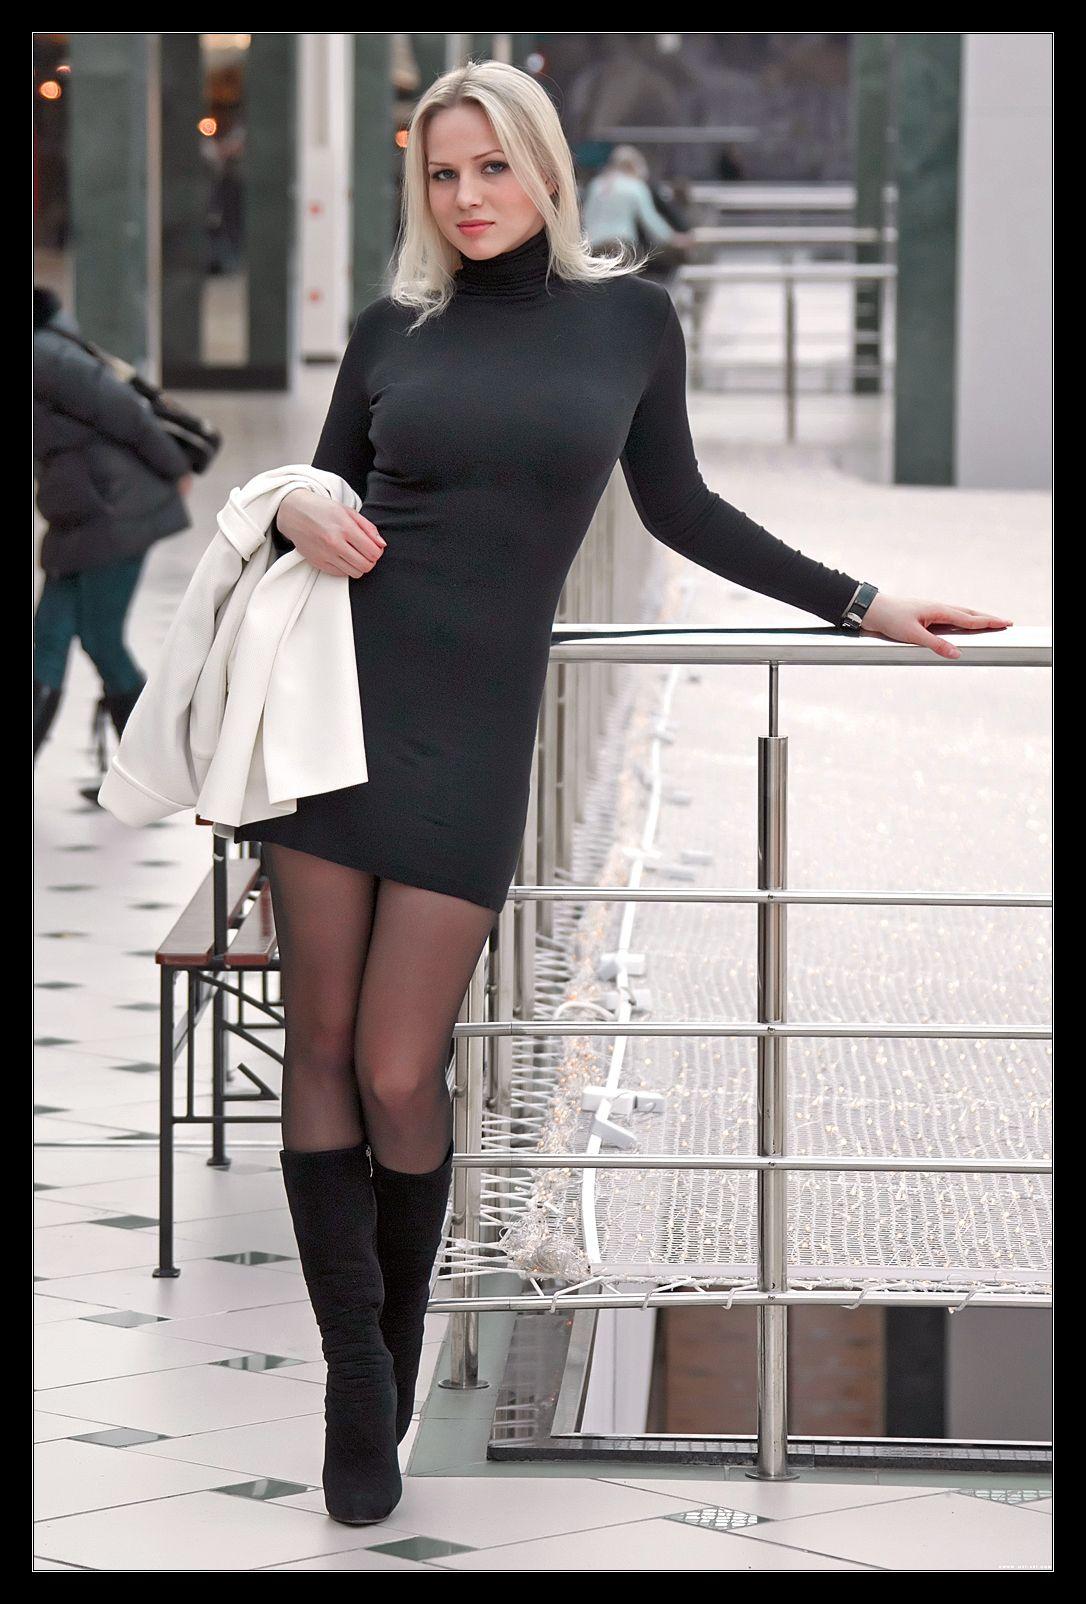 What Boot High Tall Heel Wear Black